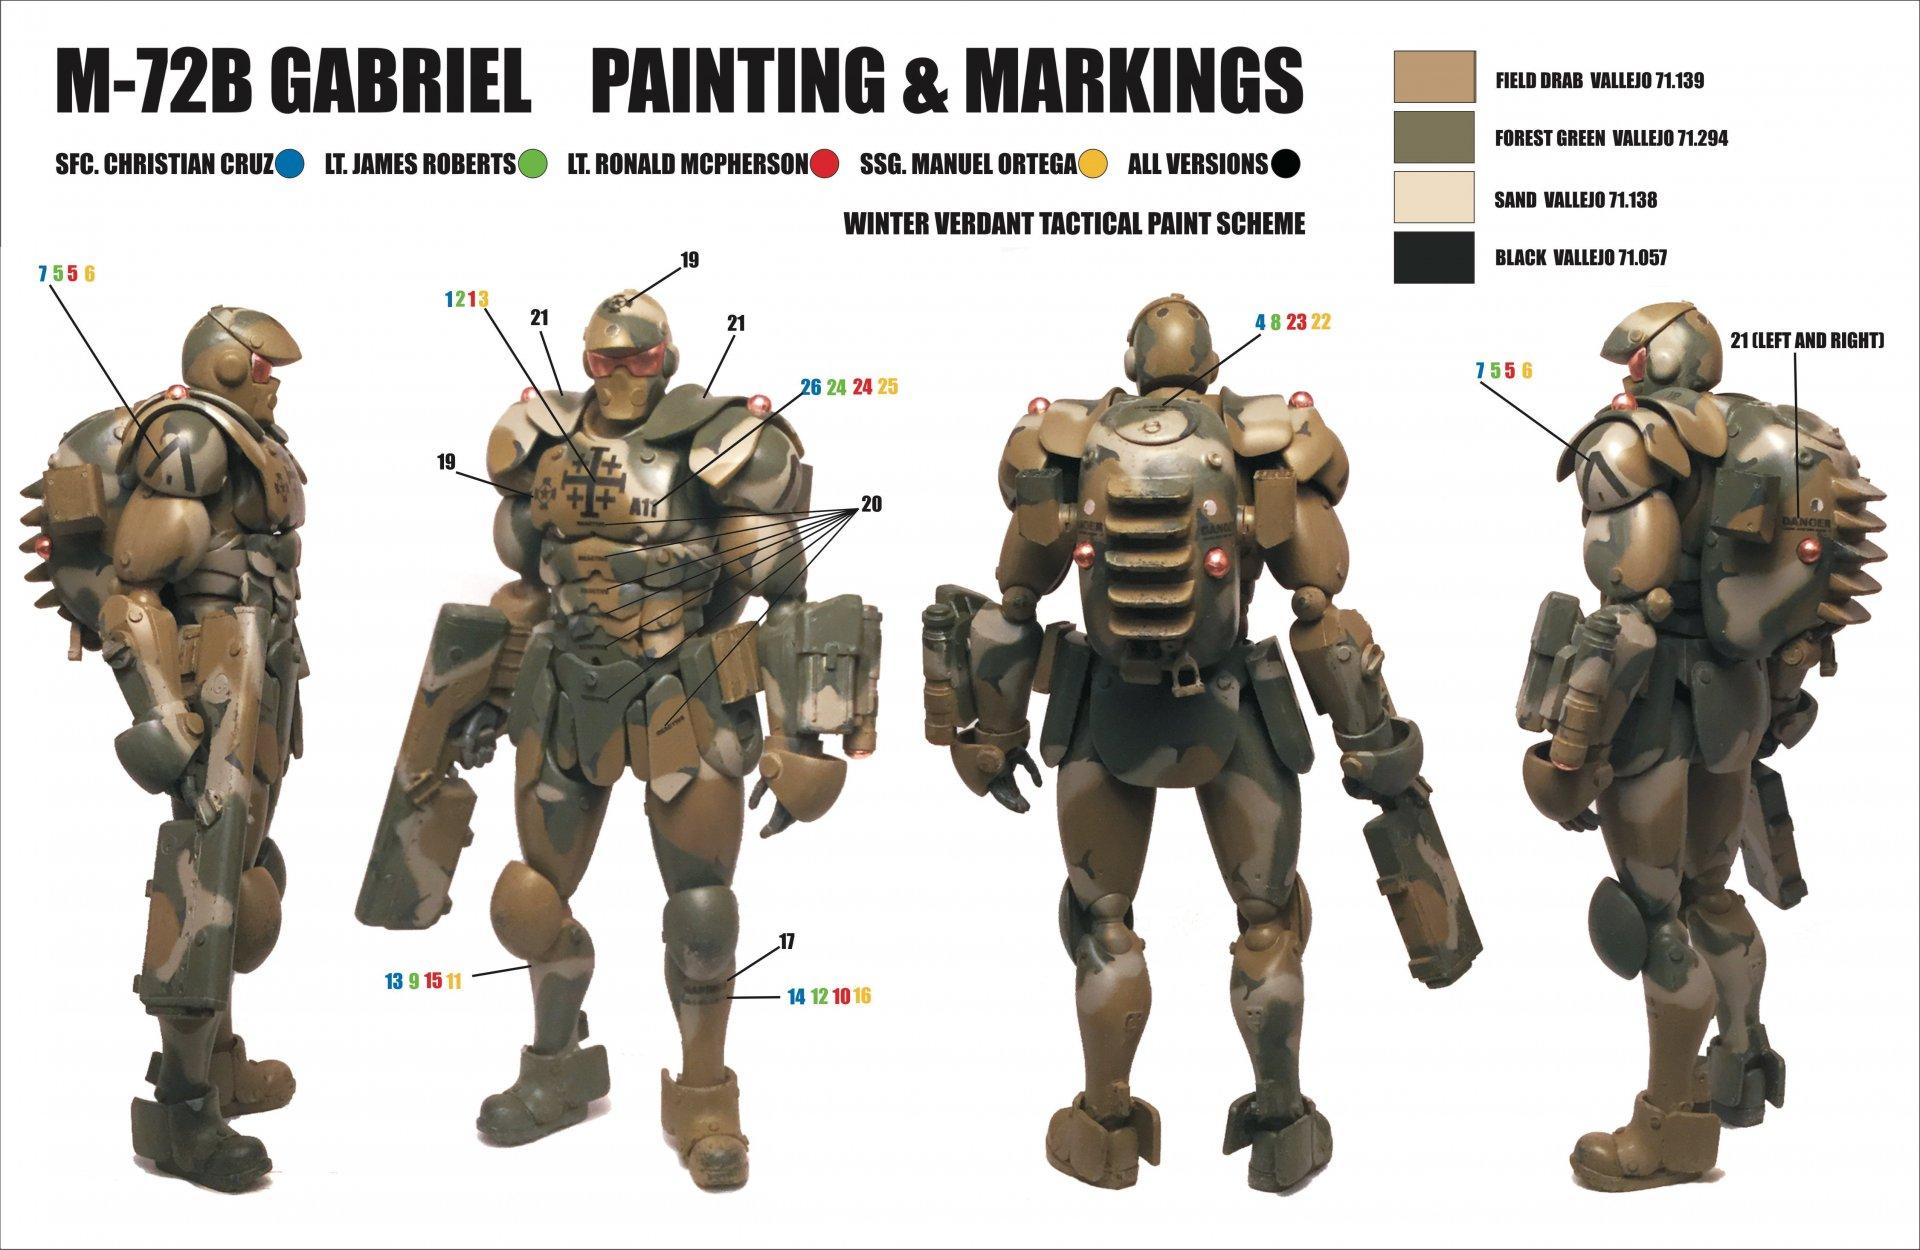 M72 gabriel painting guide.jpg